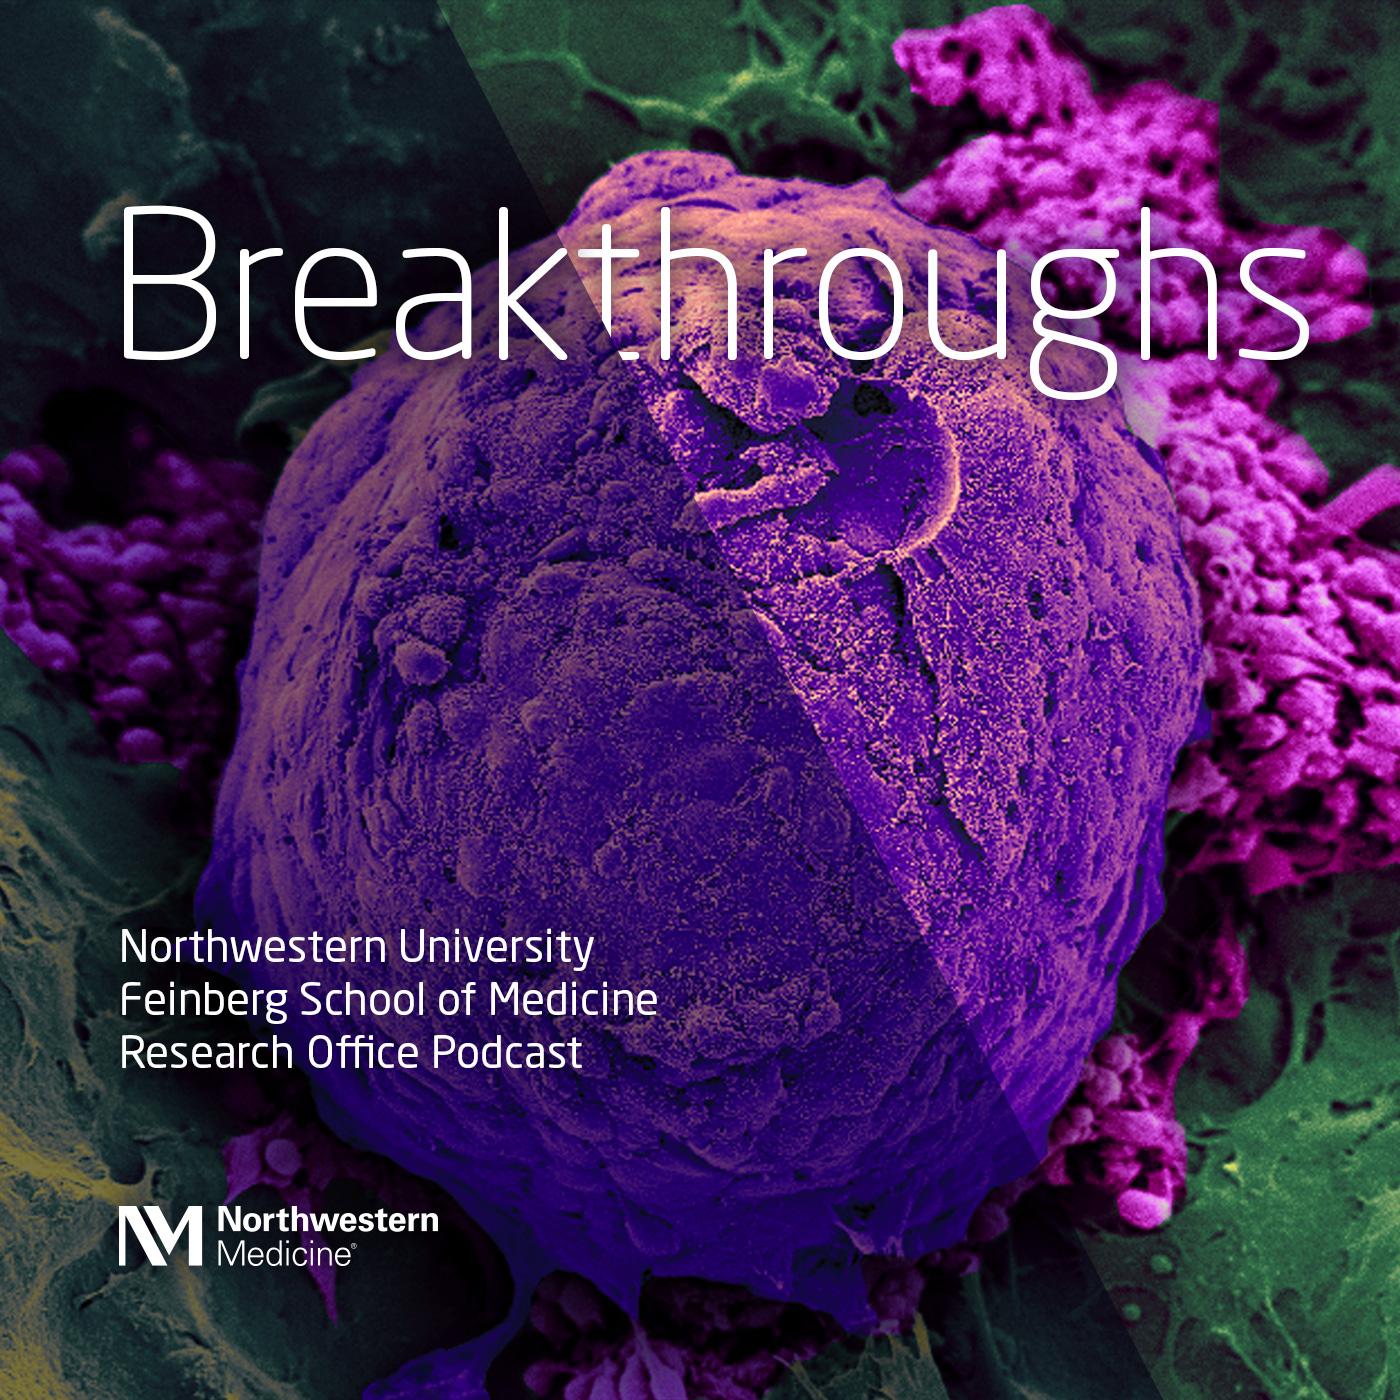 Breakthroughs | Listen via Stitcher for Podcasts